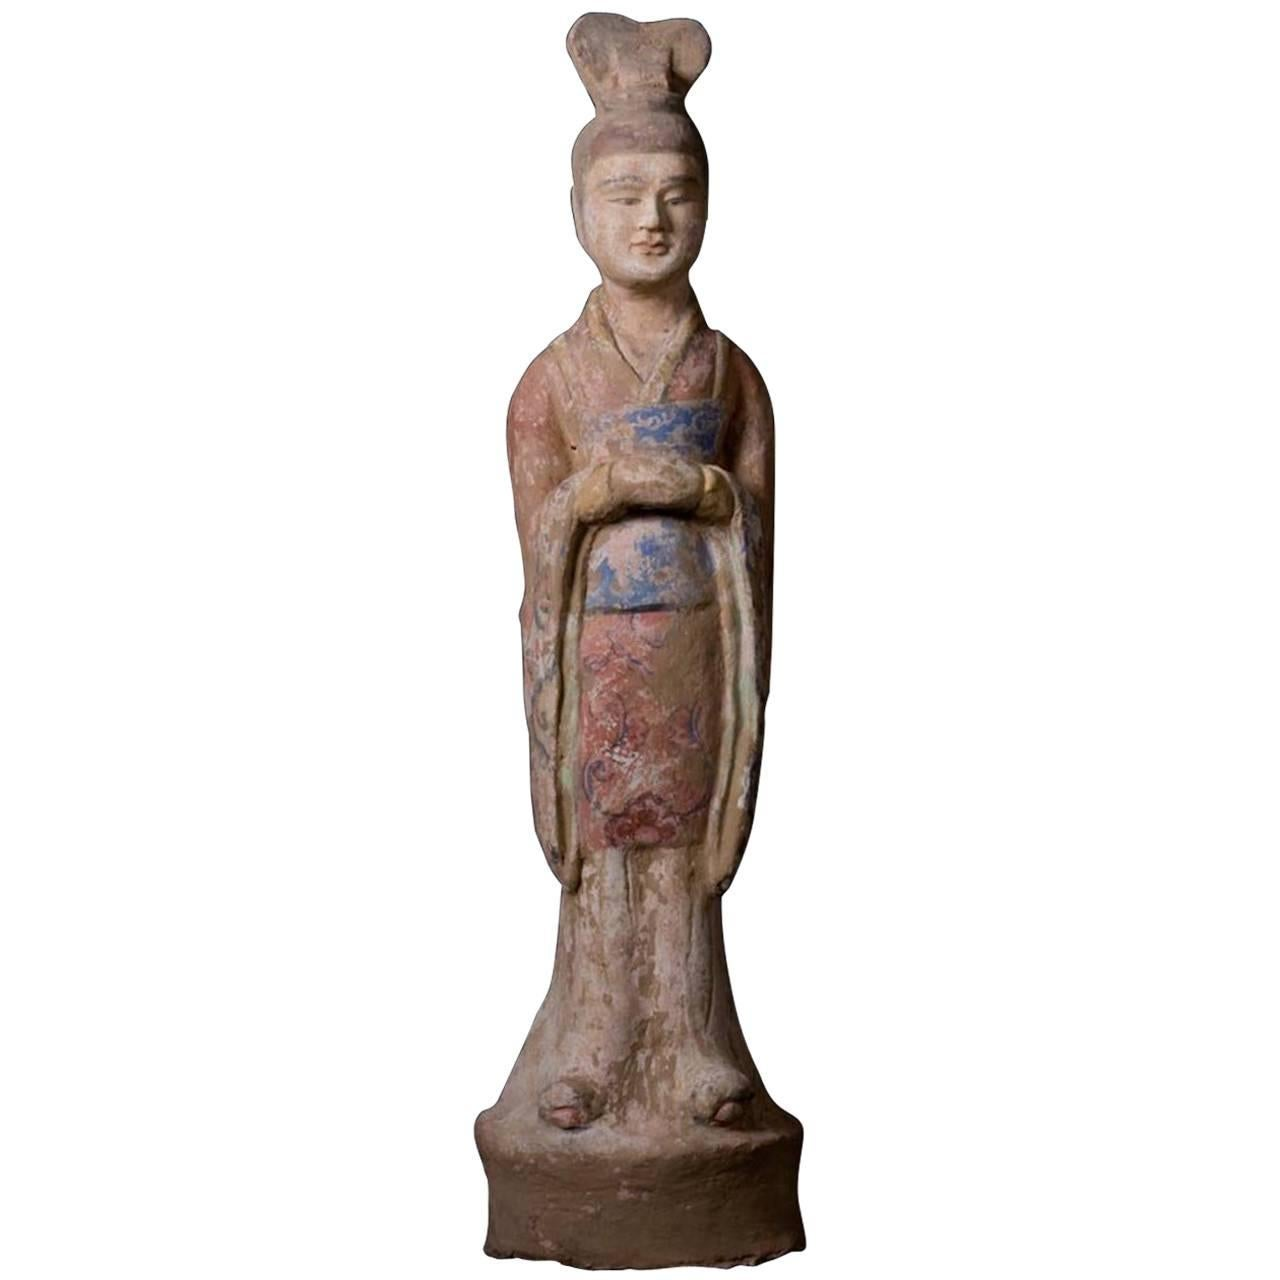 Elegant Tang Dynasty Dignitary in Orange Terracotta, China '618-907 AD'